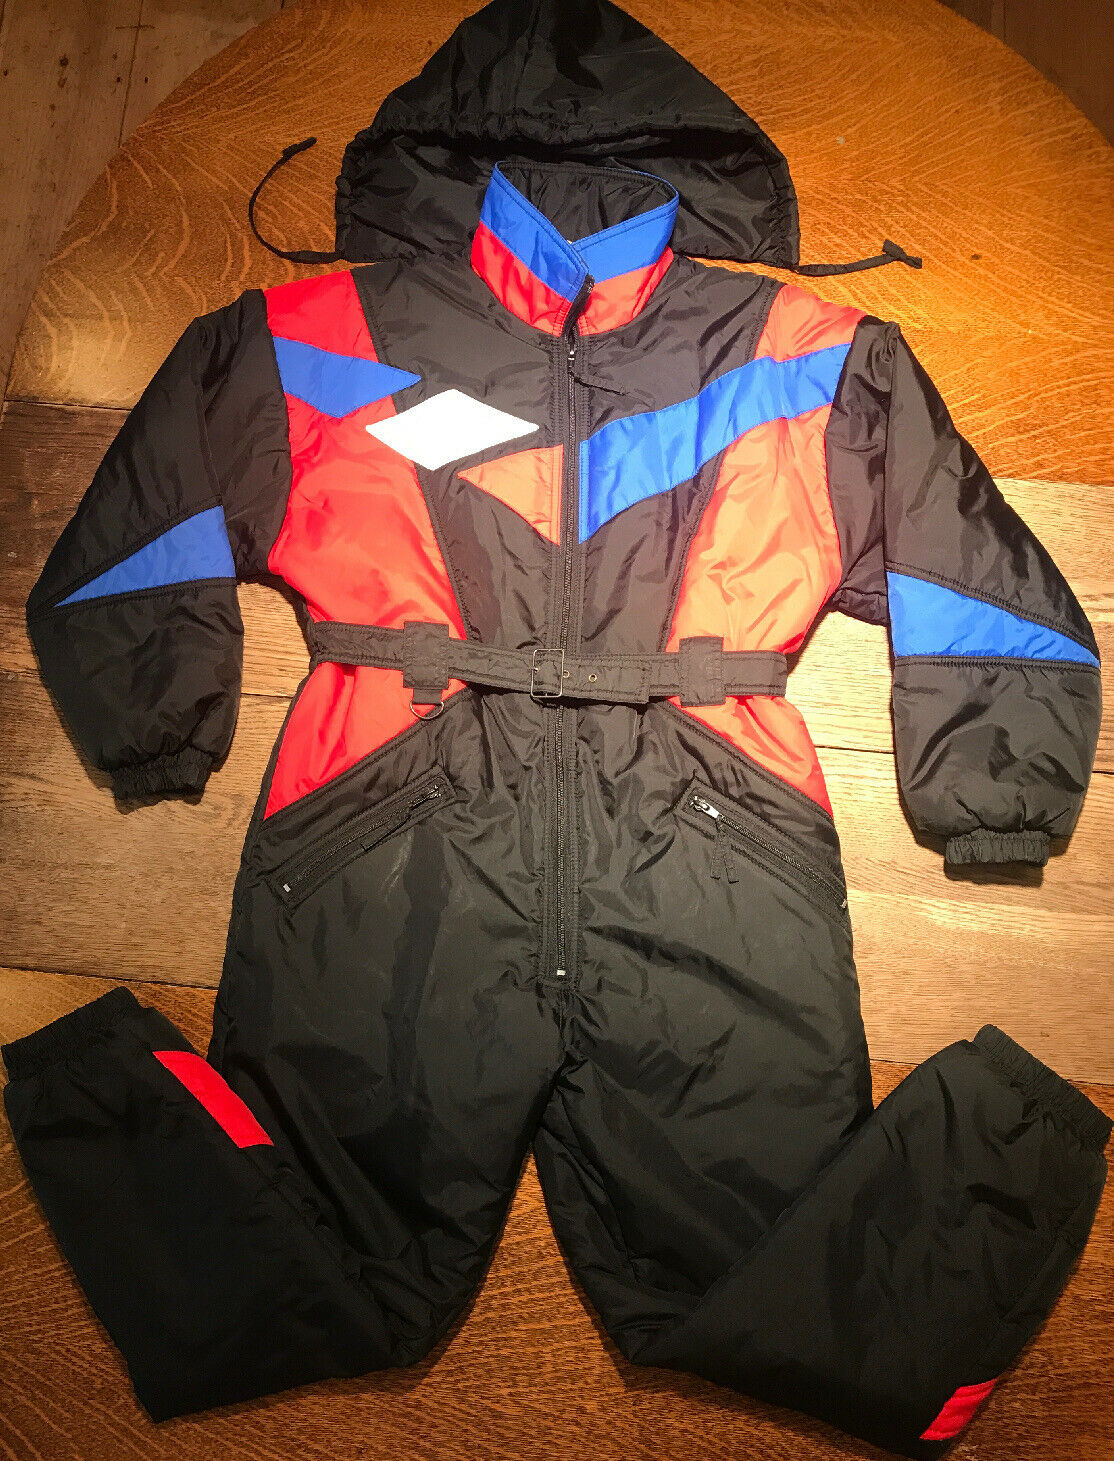 VTG 90s Apparatus One Piece Snow Ski Suit Farbe Block Geometric Youth L 14-16